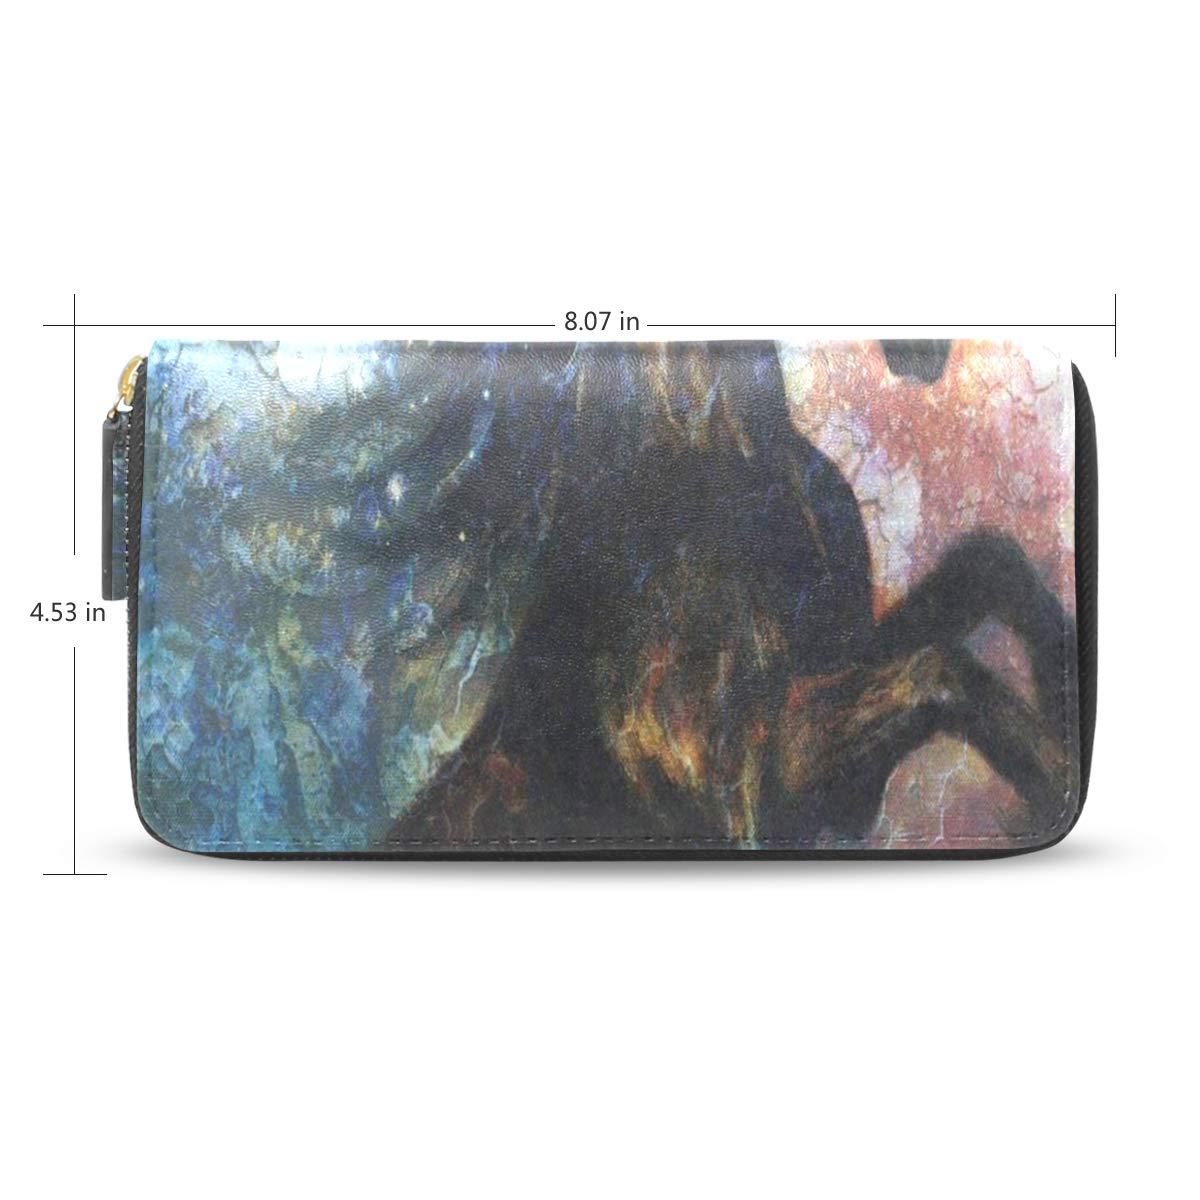 Womens Wallets Black Unicorn Art Painting Leather Passport Wallet Coin Purse Girls Handbags